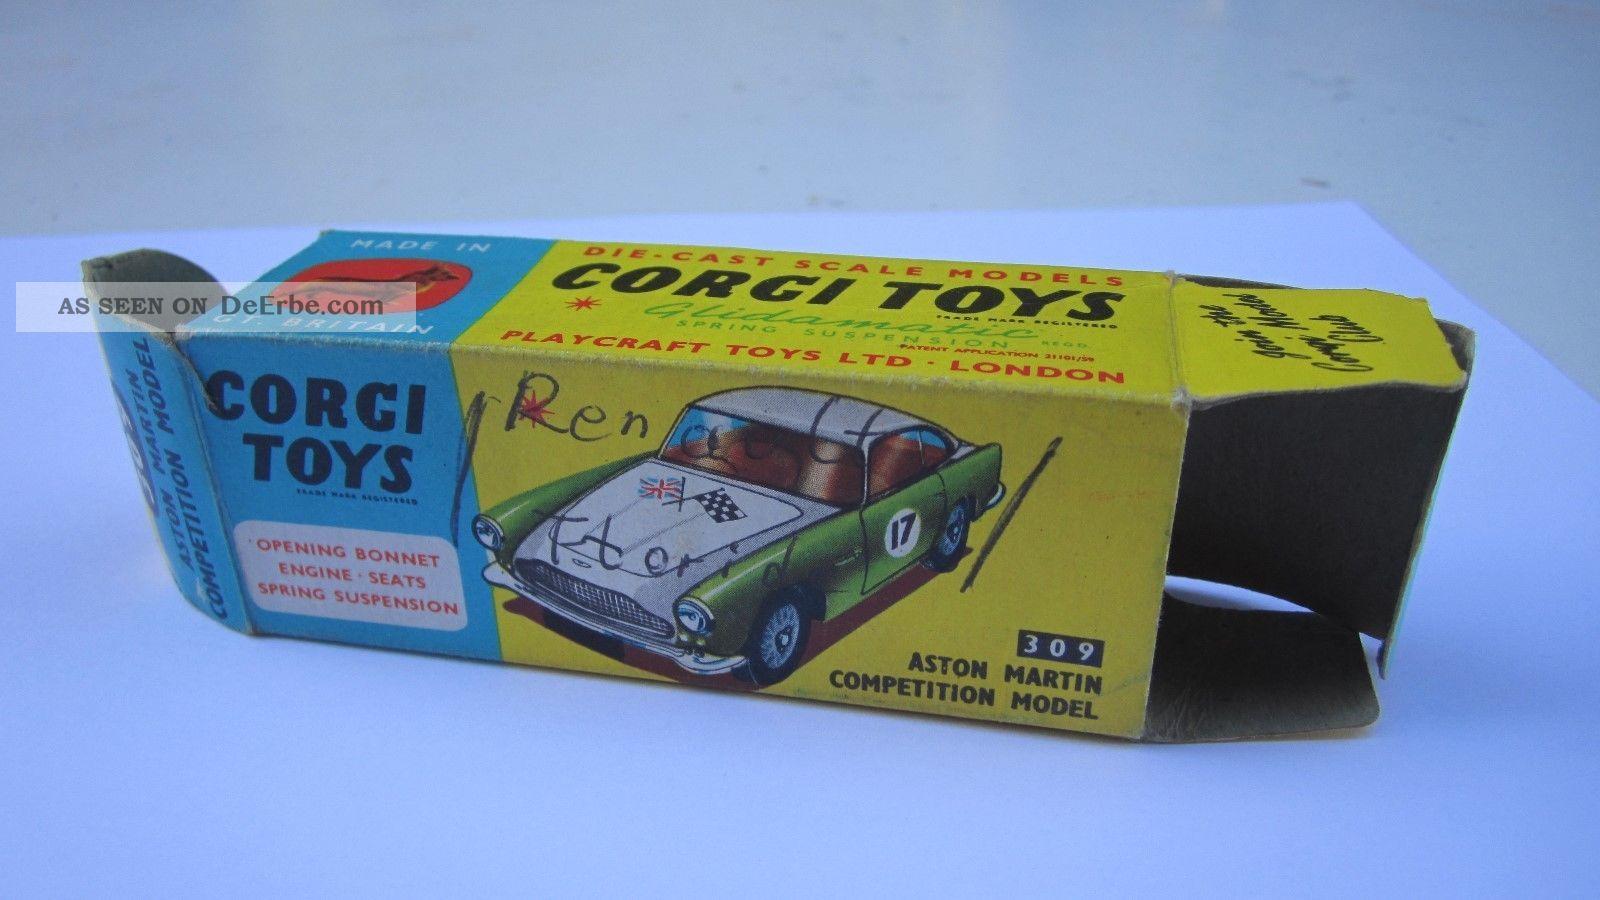 Corgi Toys 309 Aston Martin Leerschachtel Empty Box Fahrzeuge Bild